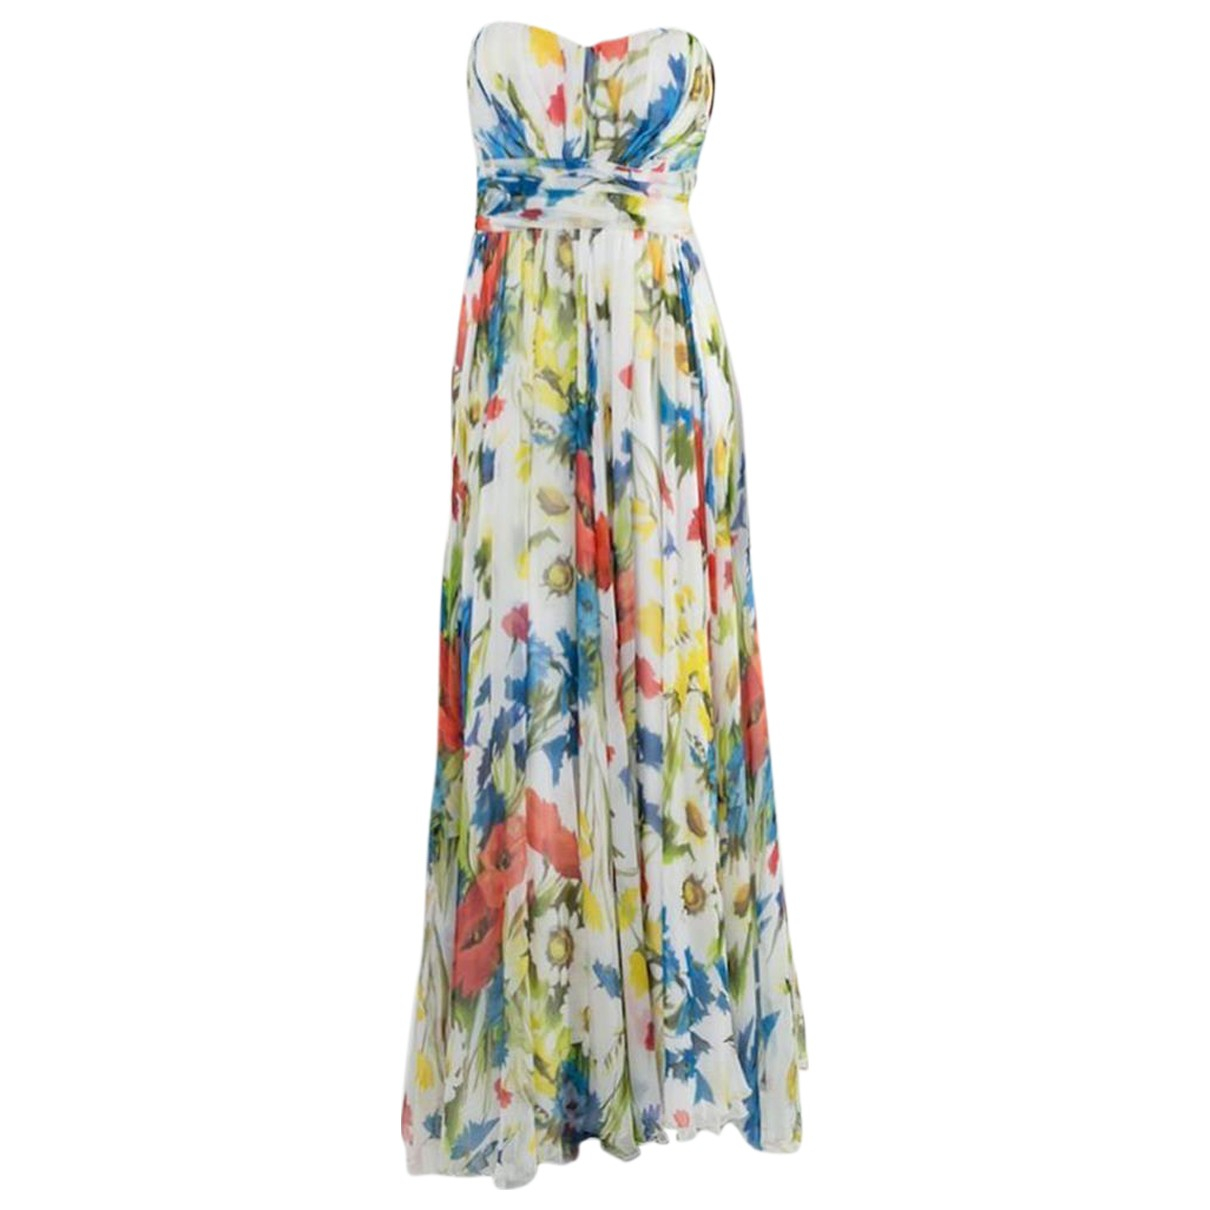 Dolce & Gabbana N Multicolour Silk dress for Women 38 IT